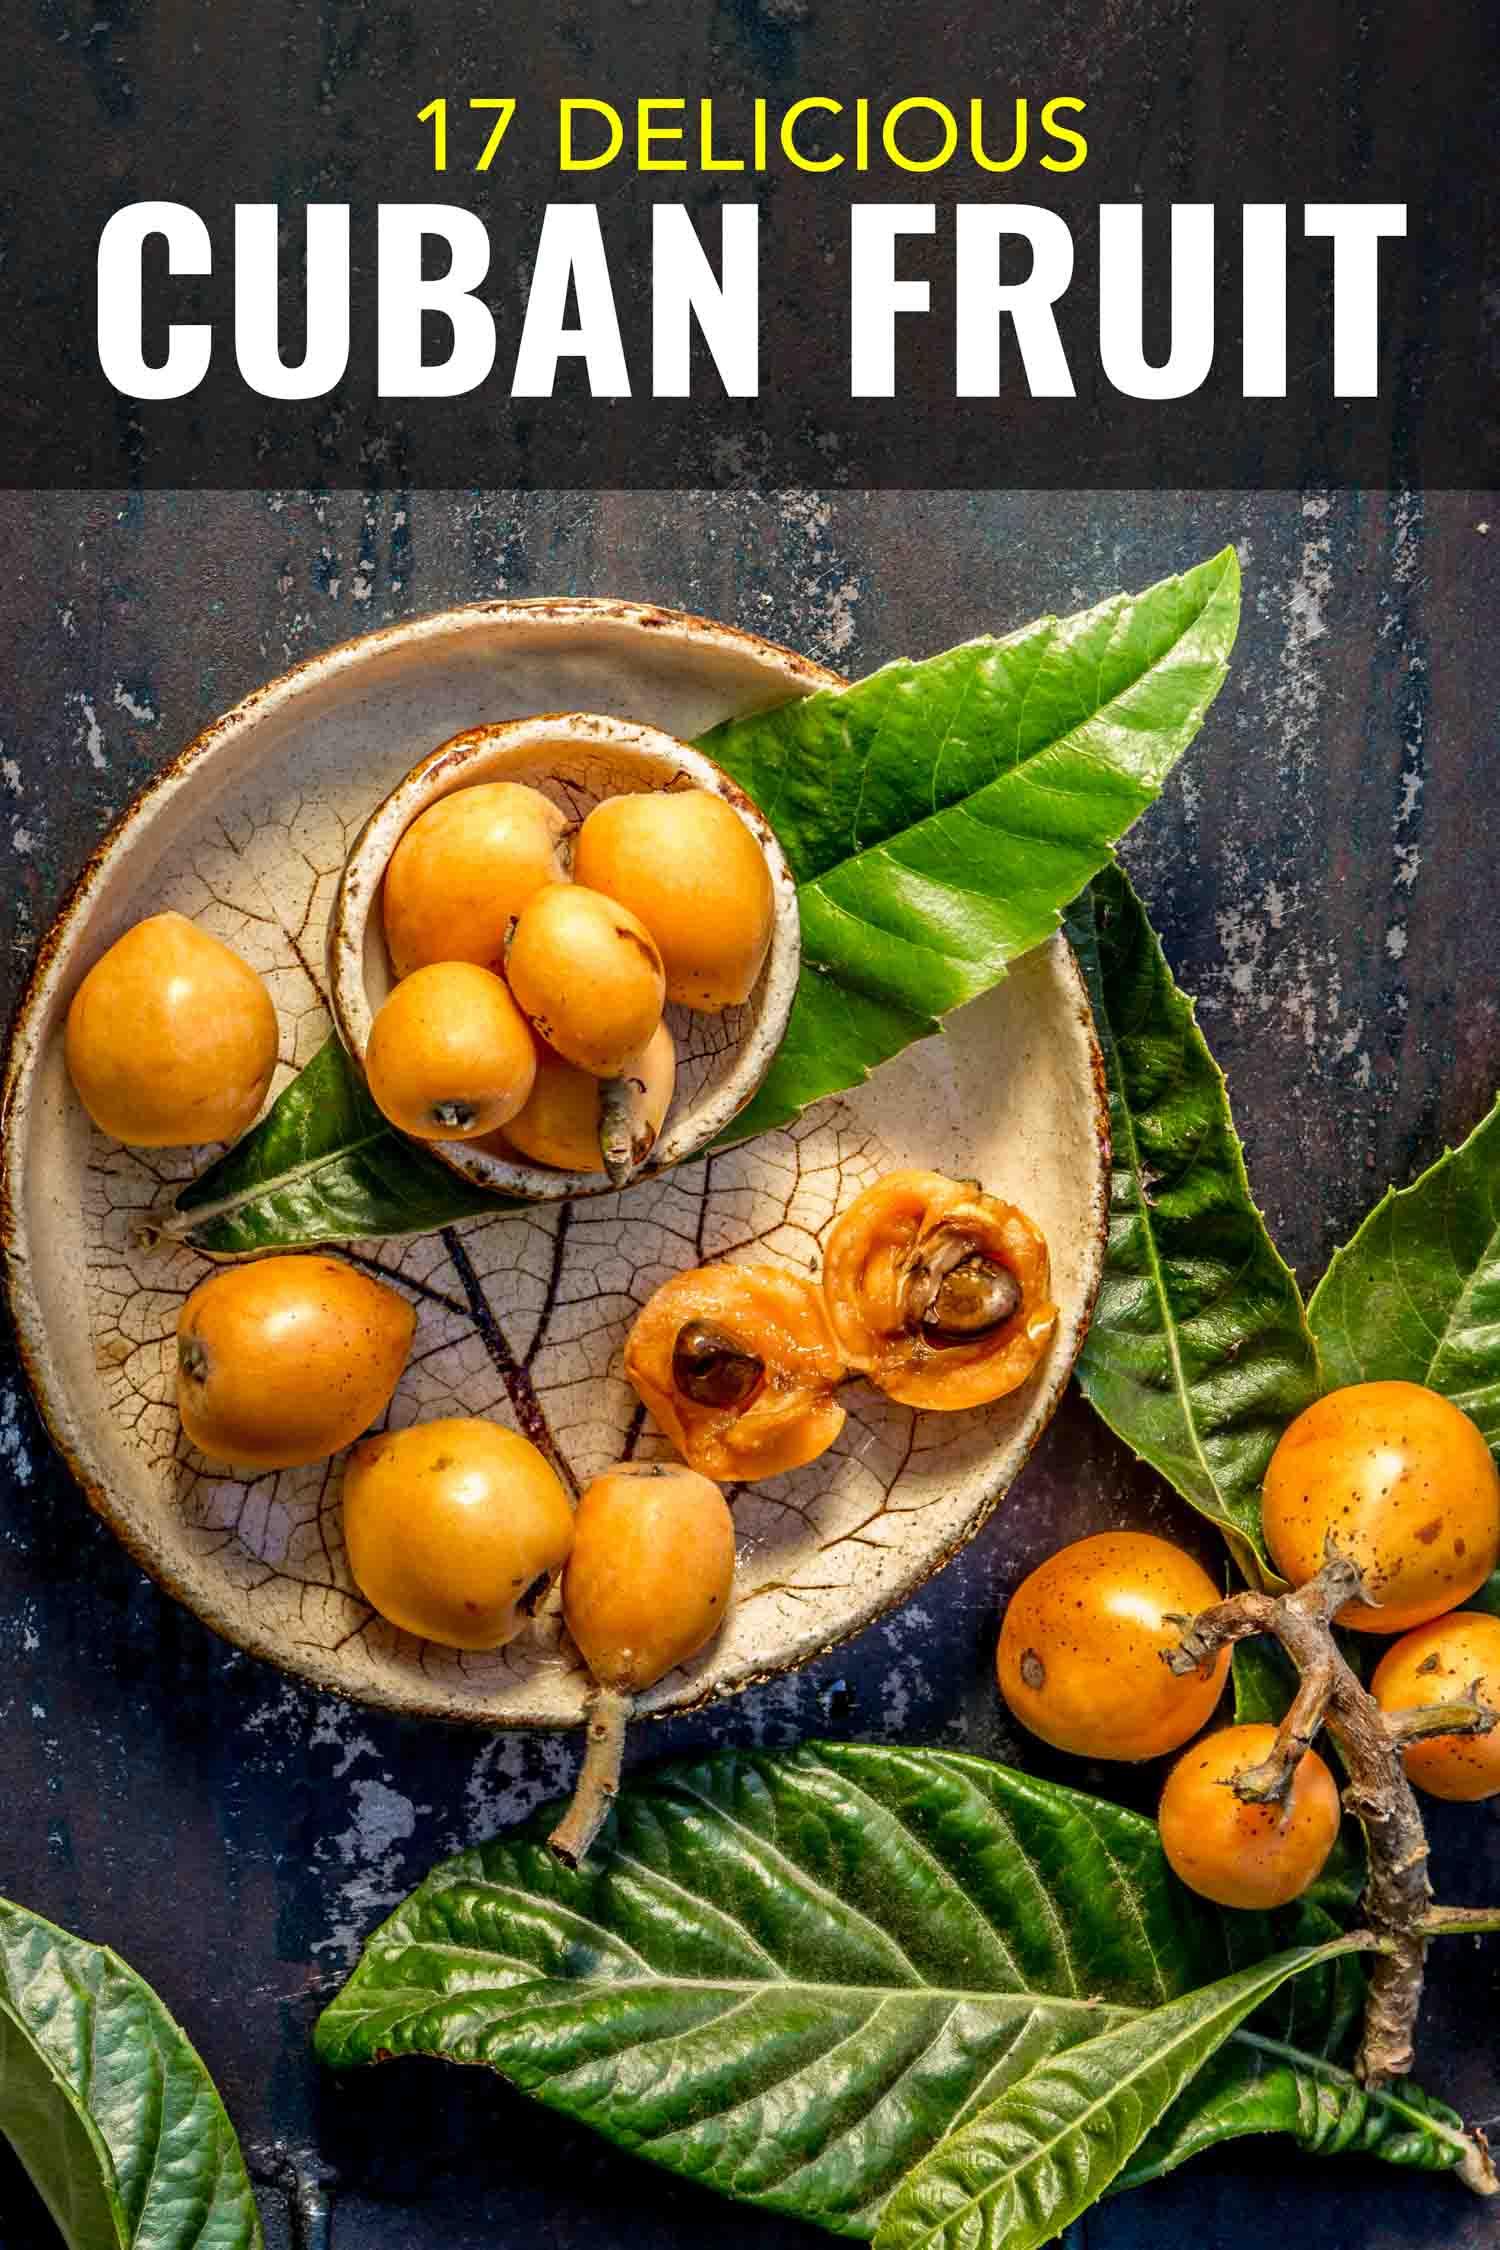 Cuban fruit nispero with leaves